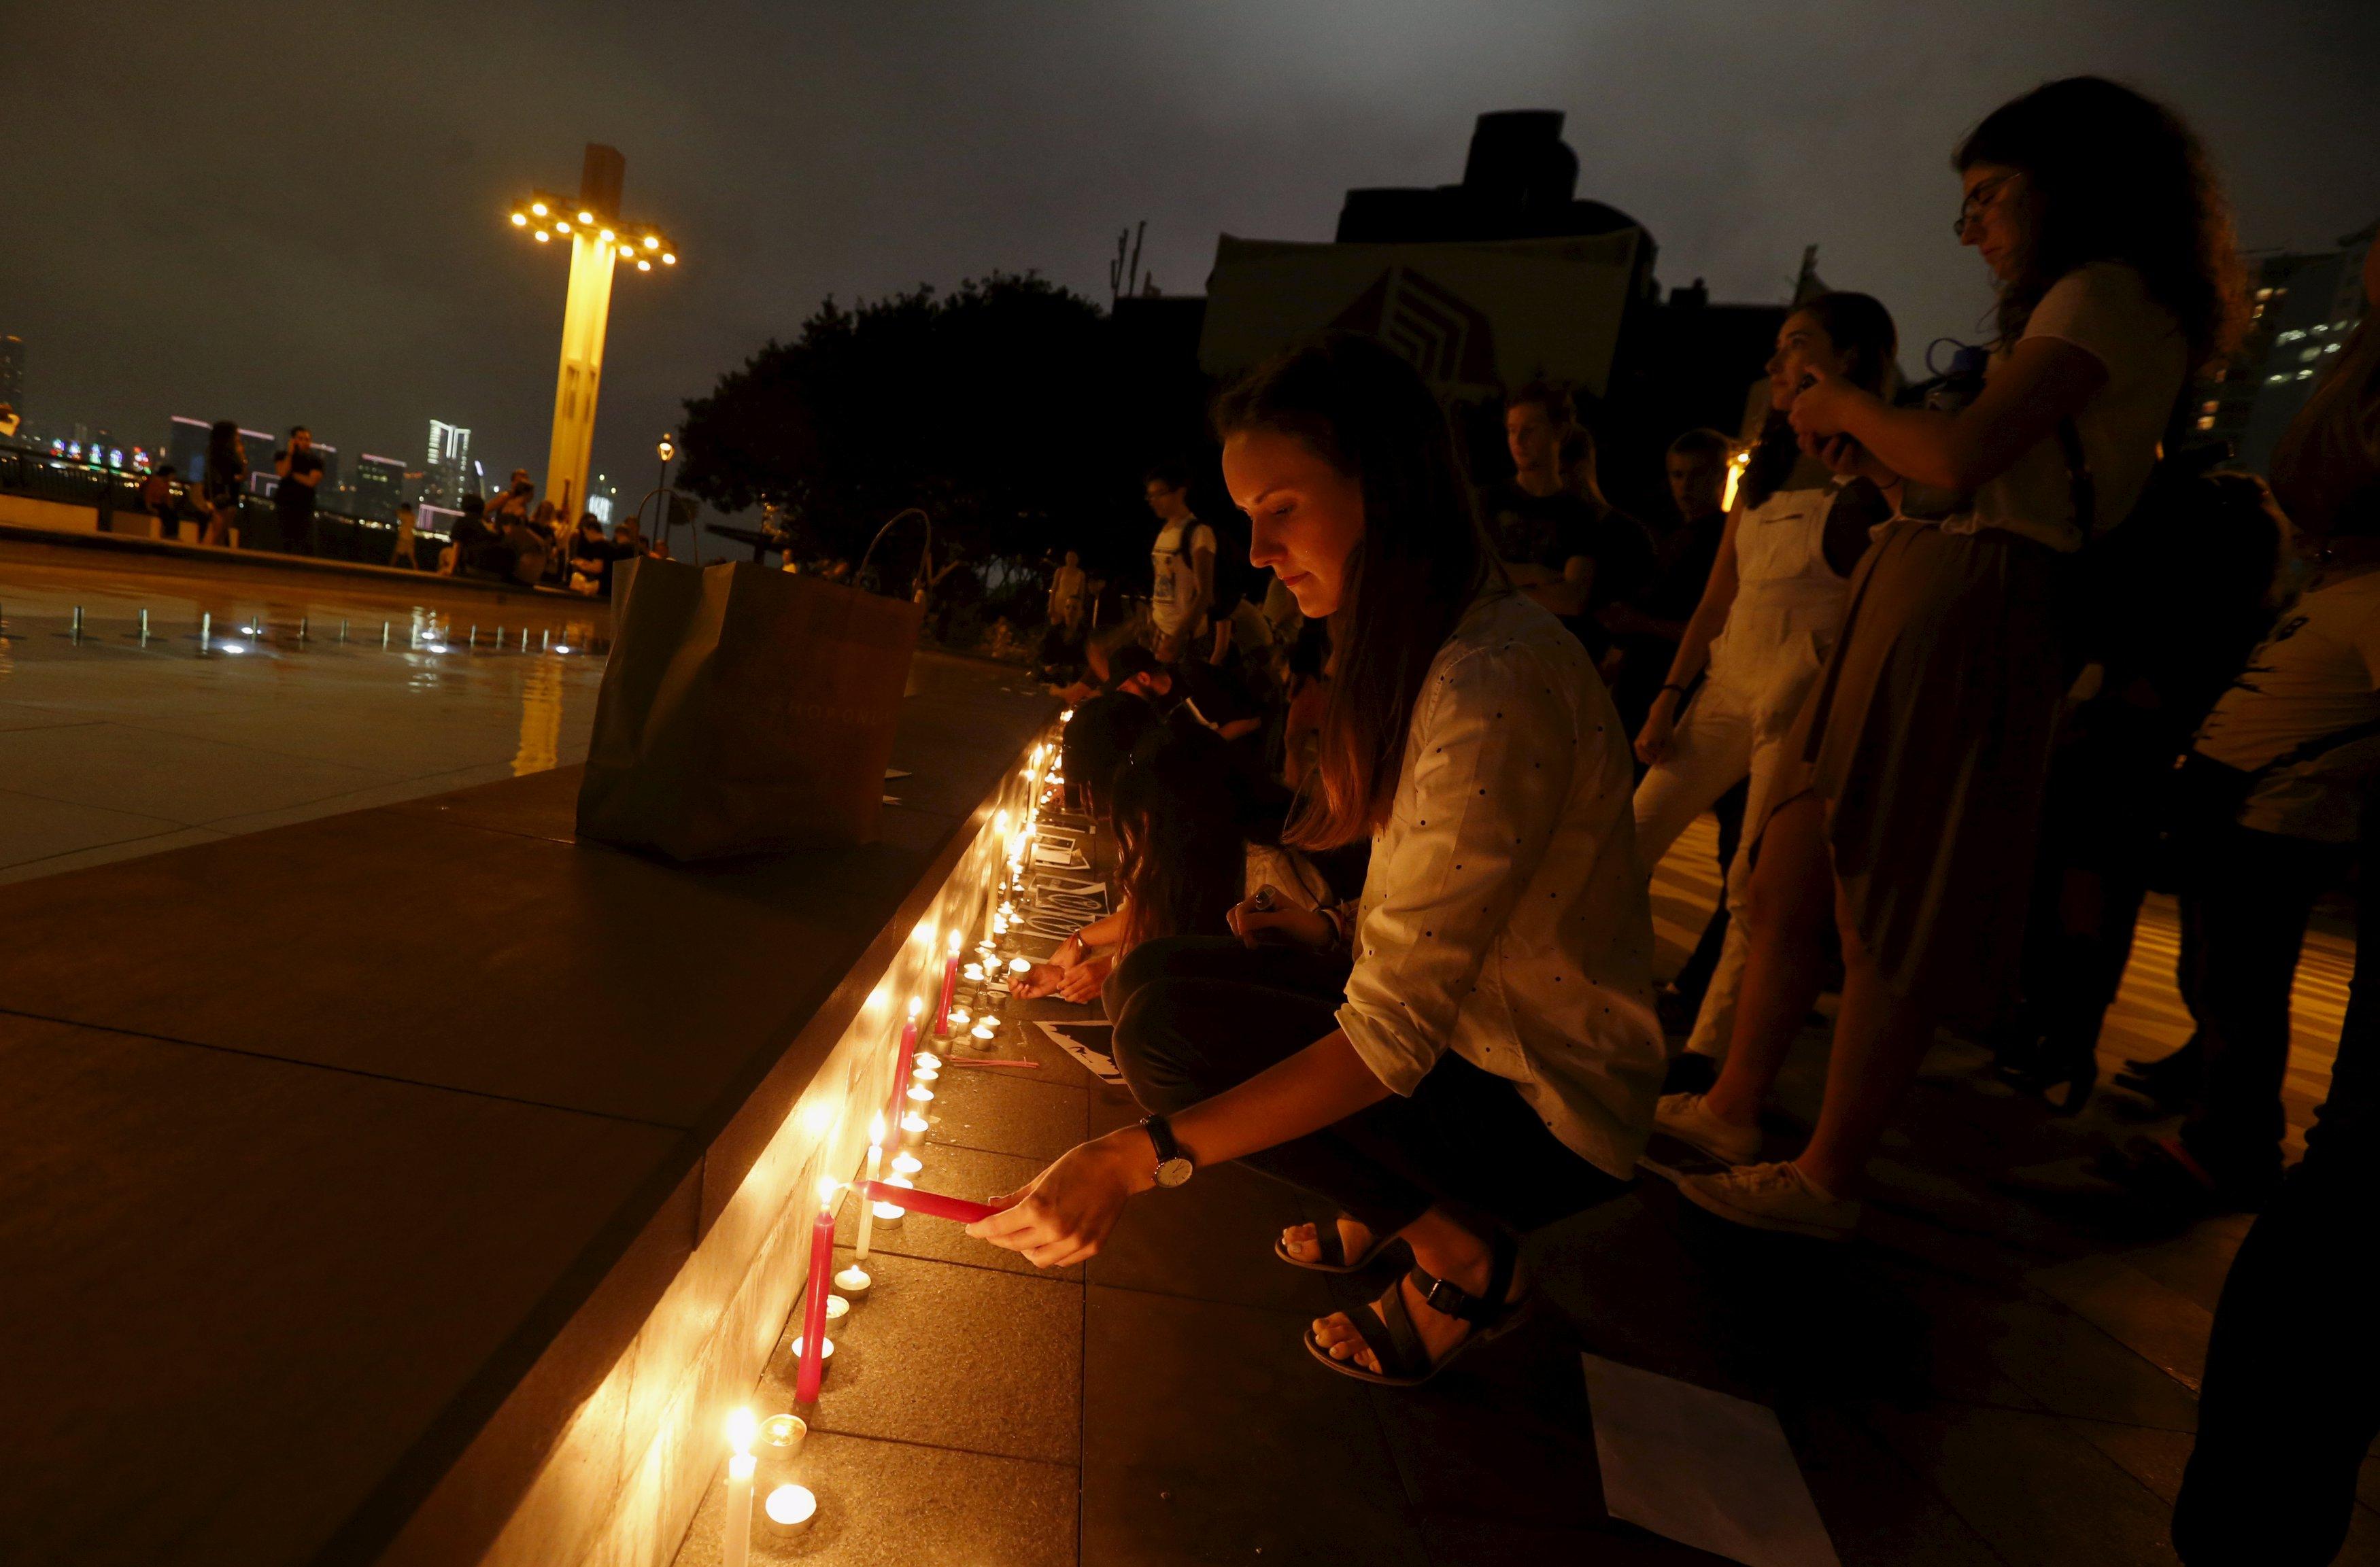 A participant lights up a candle during a vigil honoring the victims of the Paris attacks, in Hong Kong, China November 14, 2015.      REUTERS/Bobby Yip